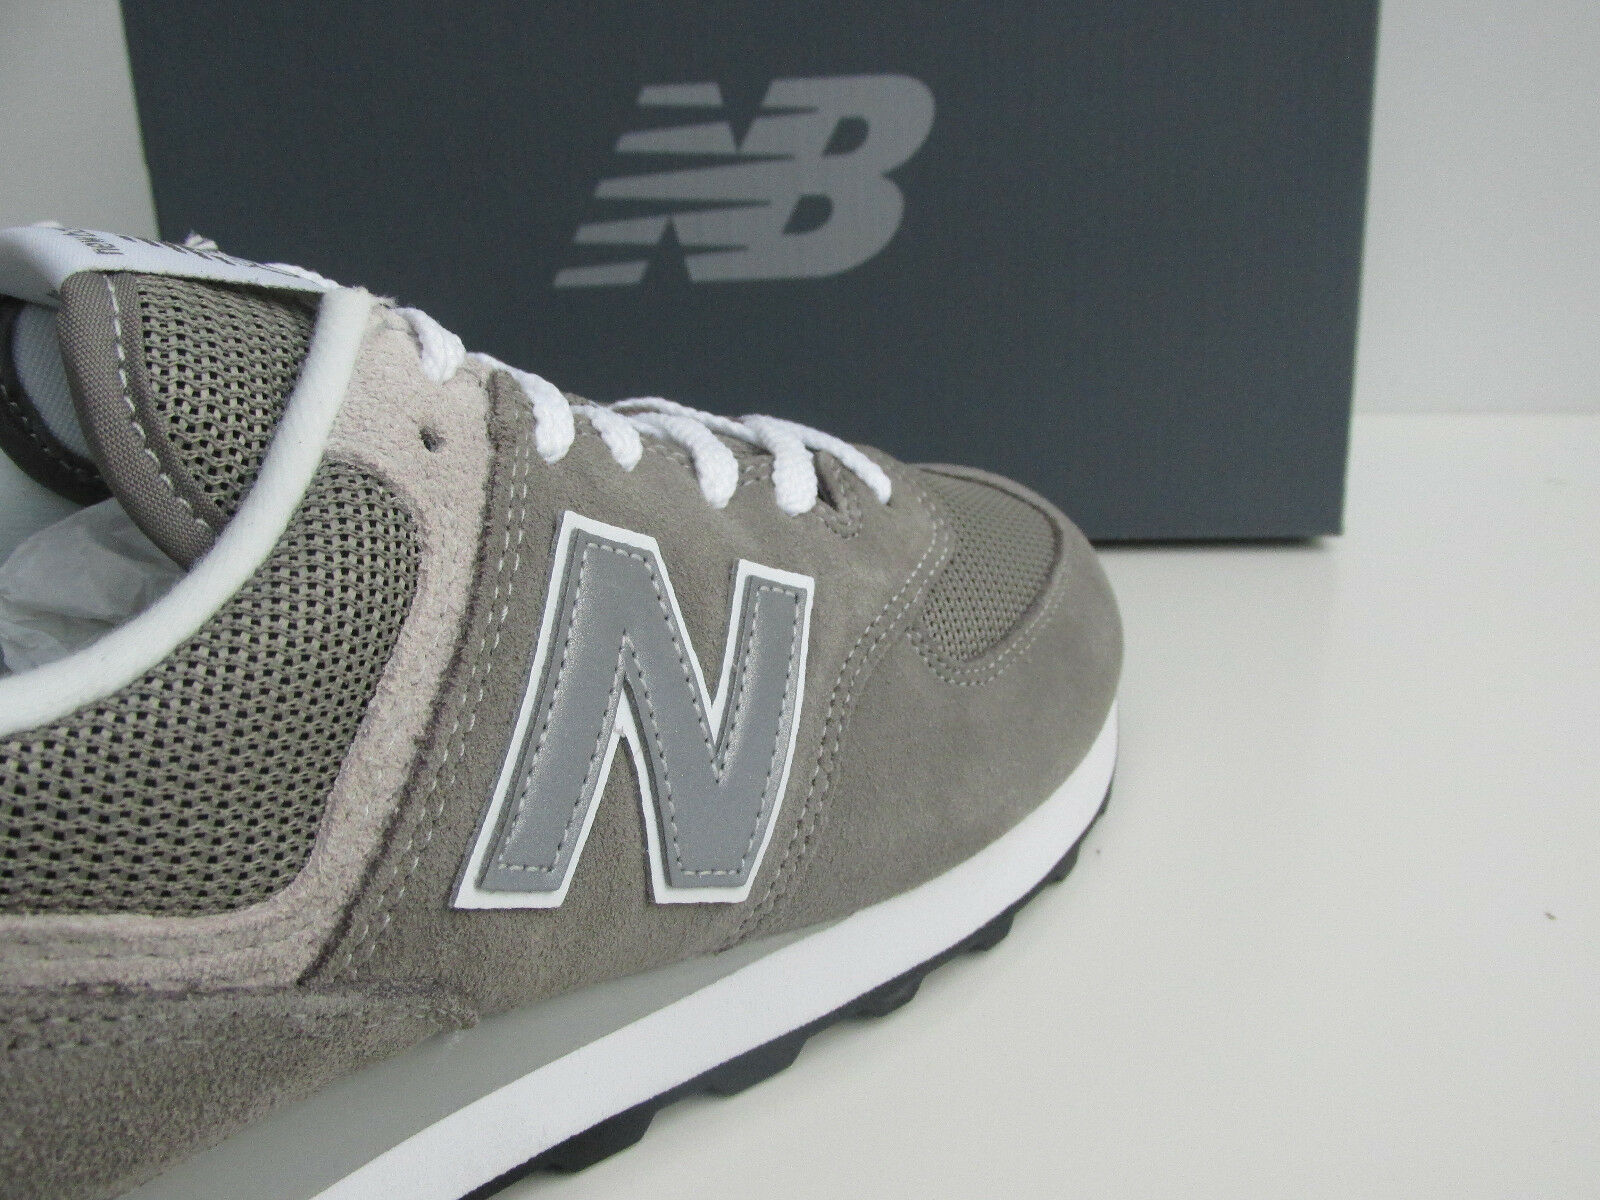 Bnib new balance 574 ei